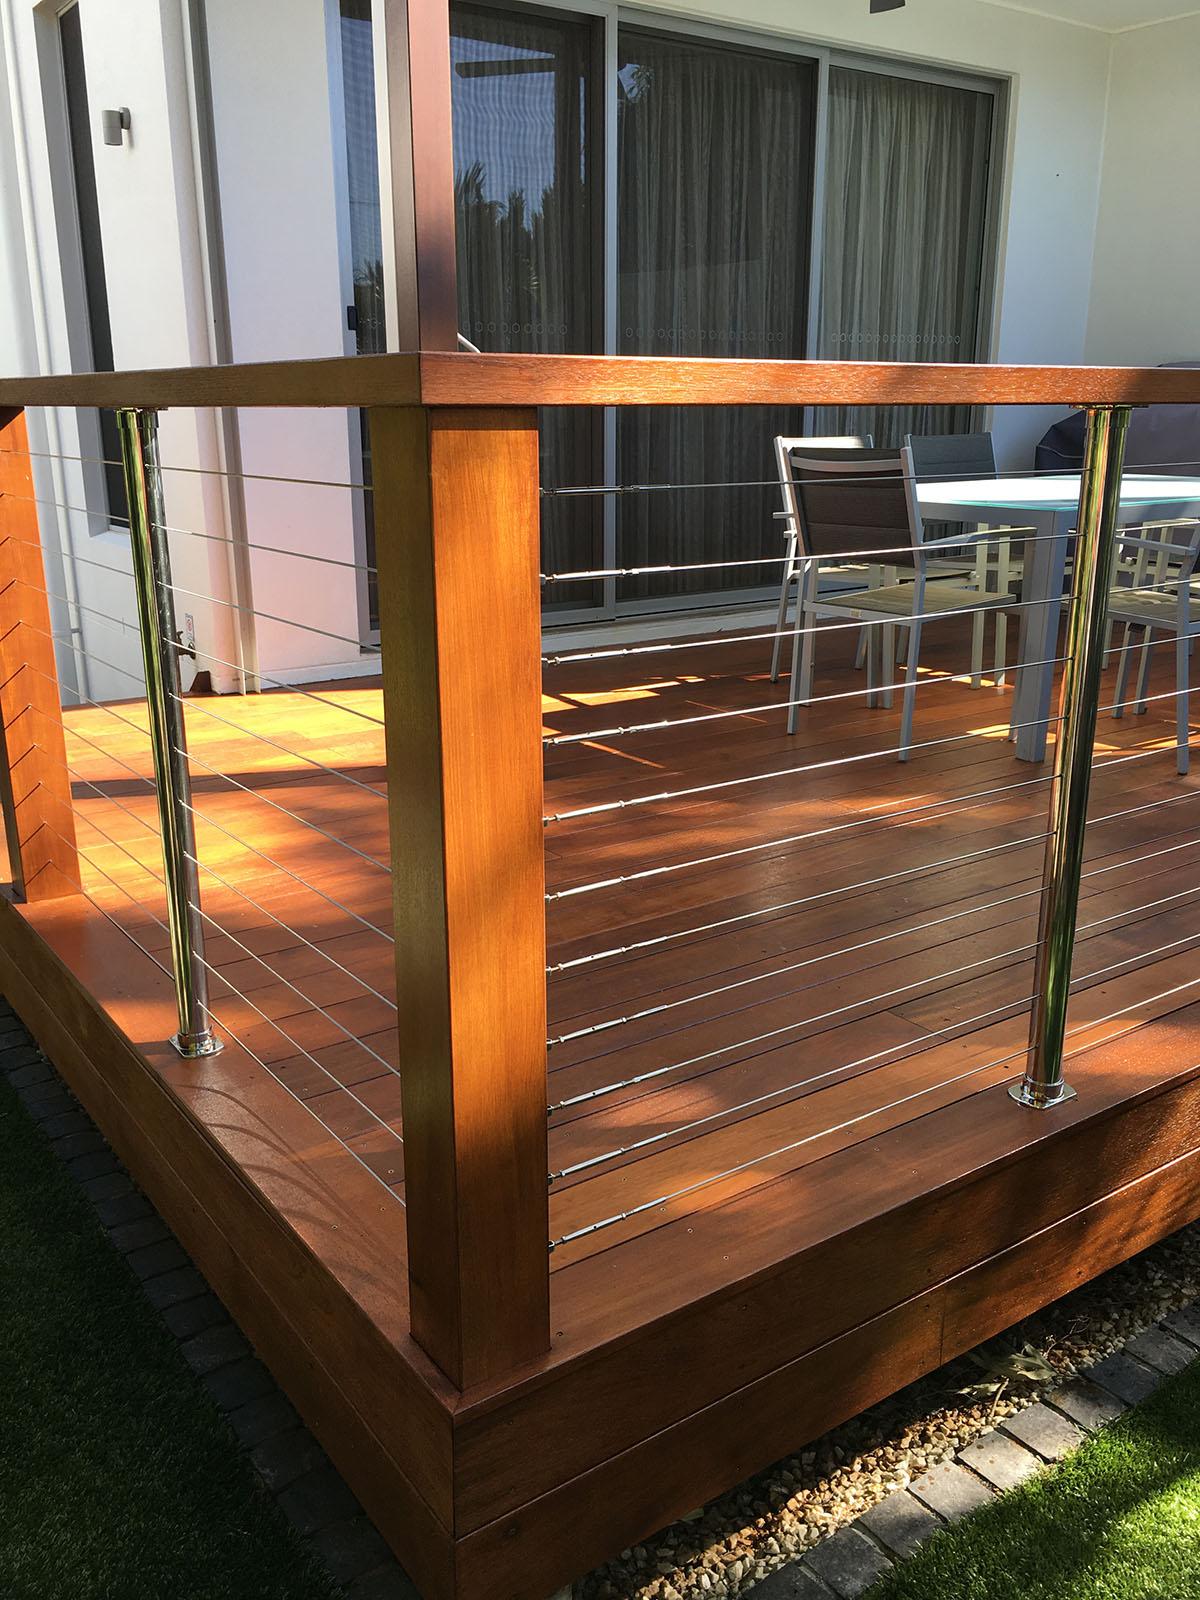 Hoys deck completion 2